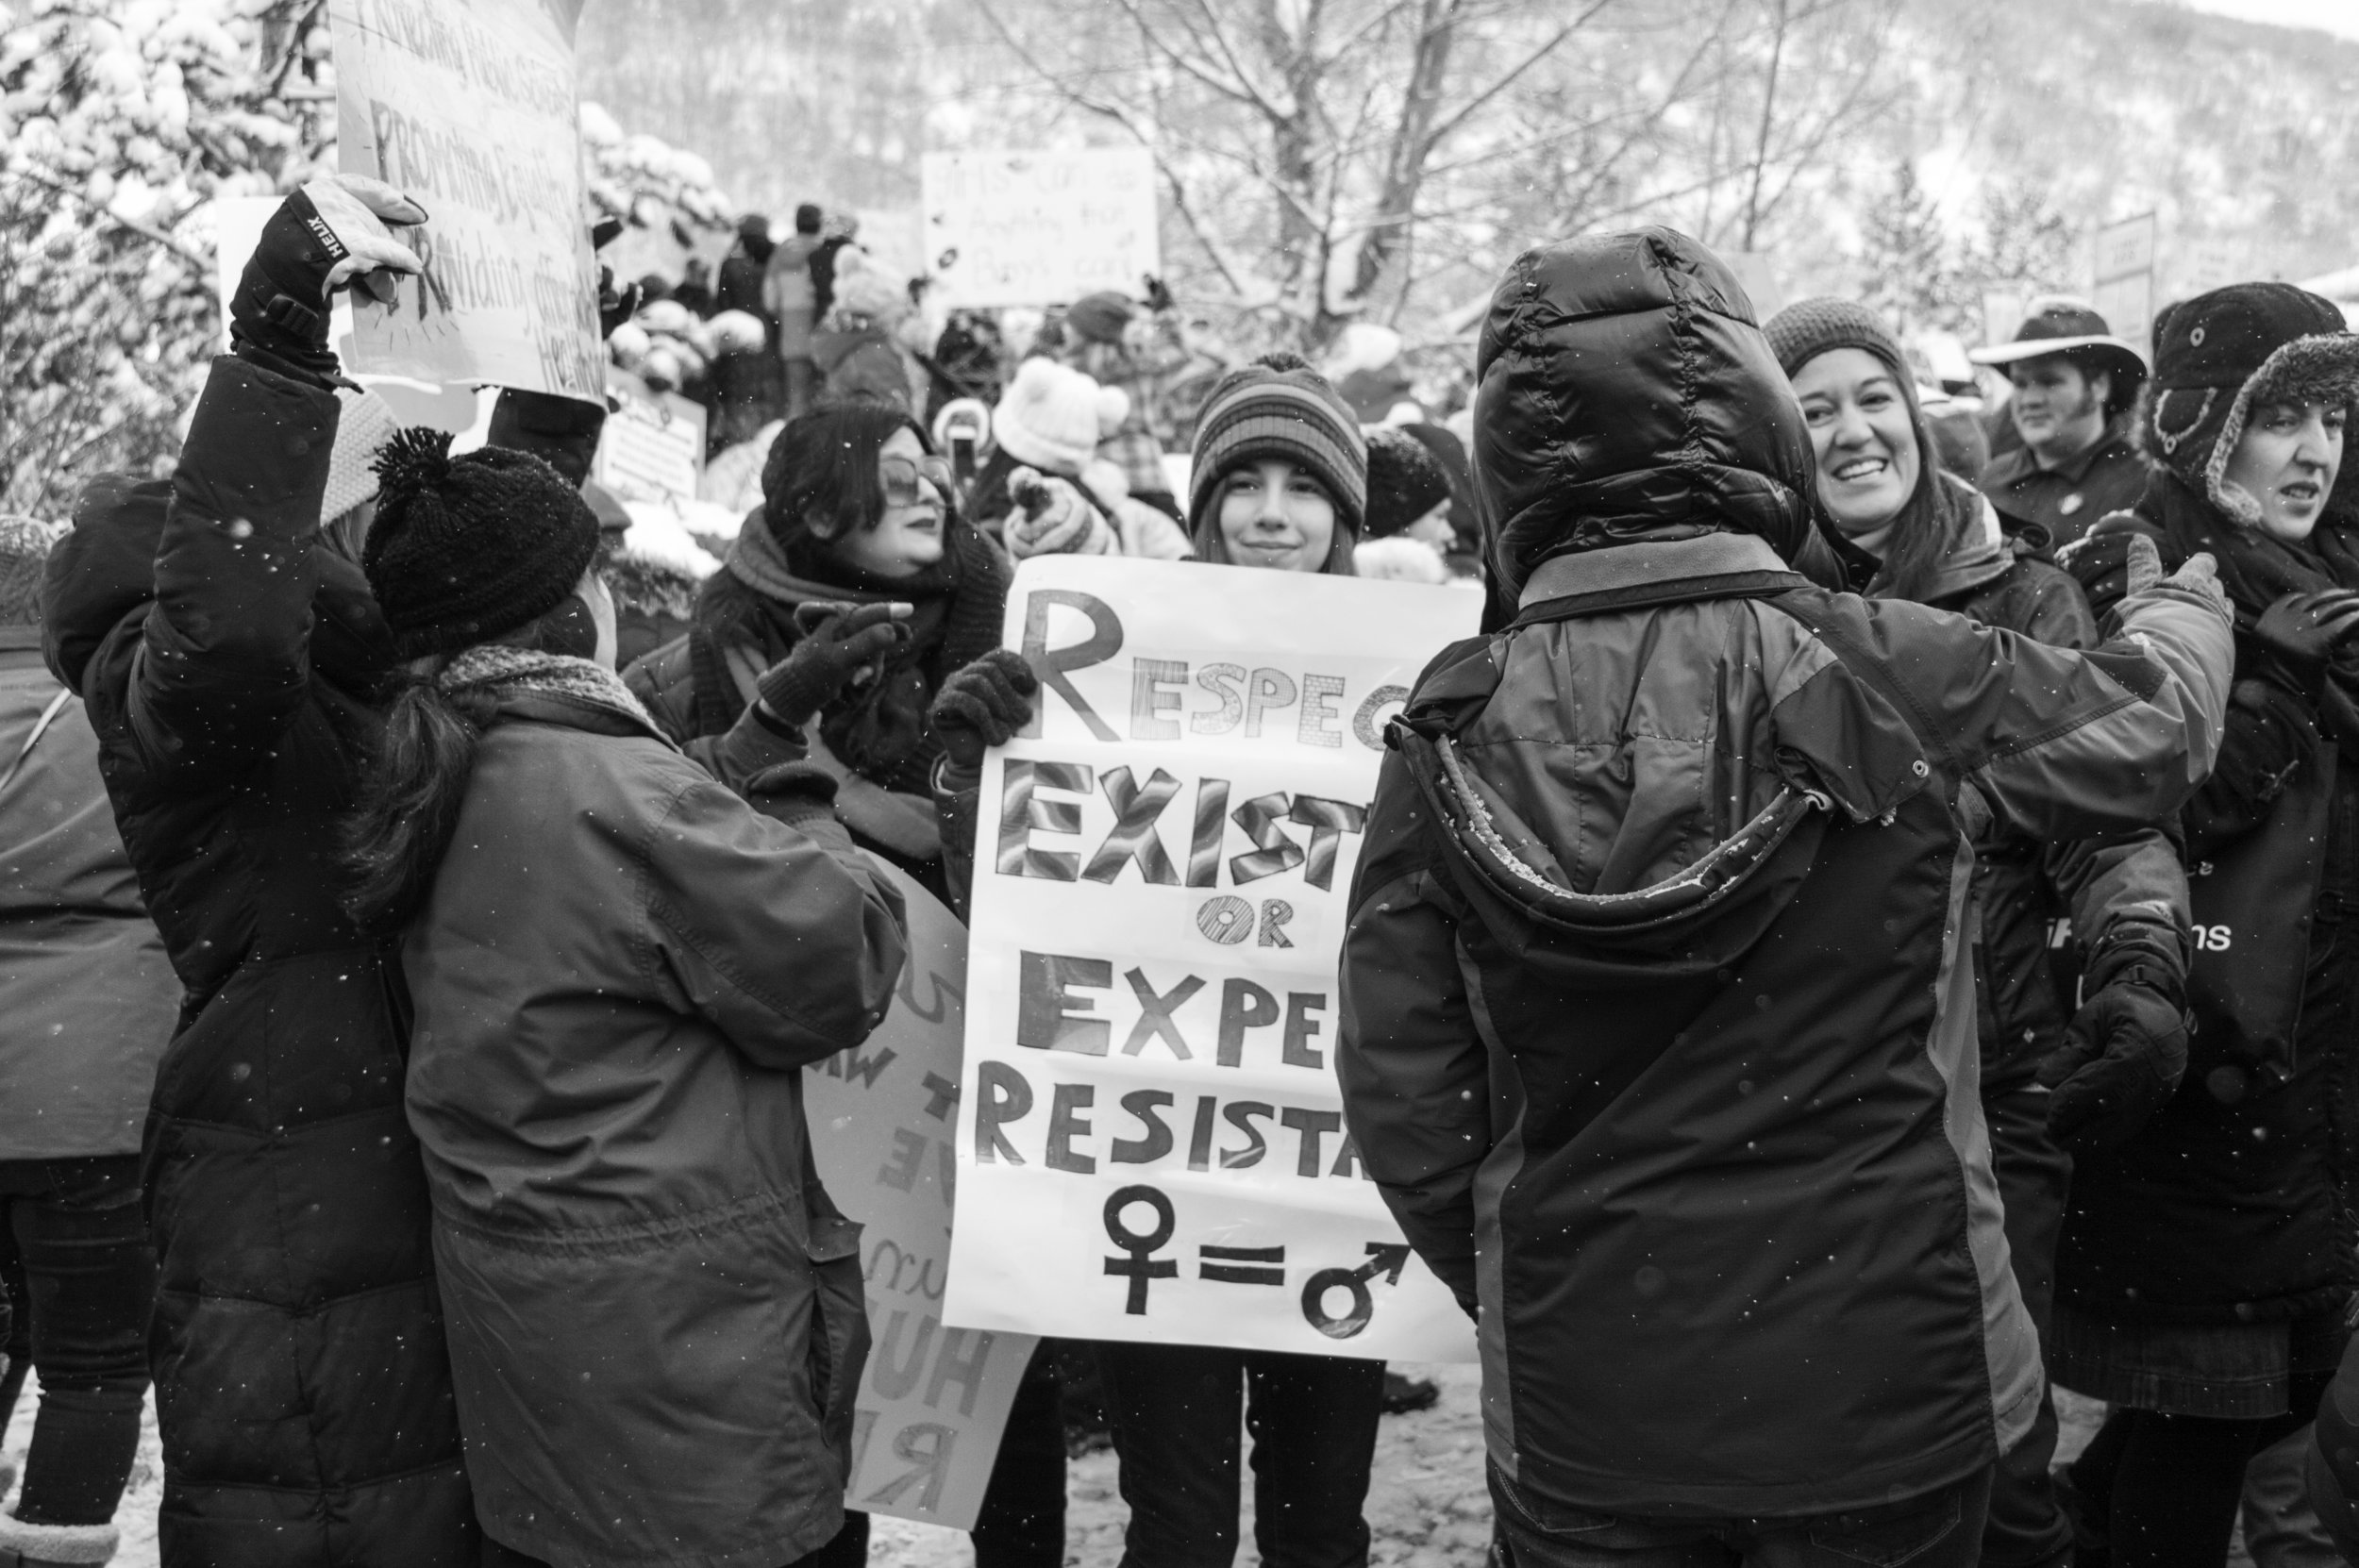 womens march_012117_gigi m kisela002.jpg